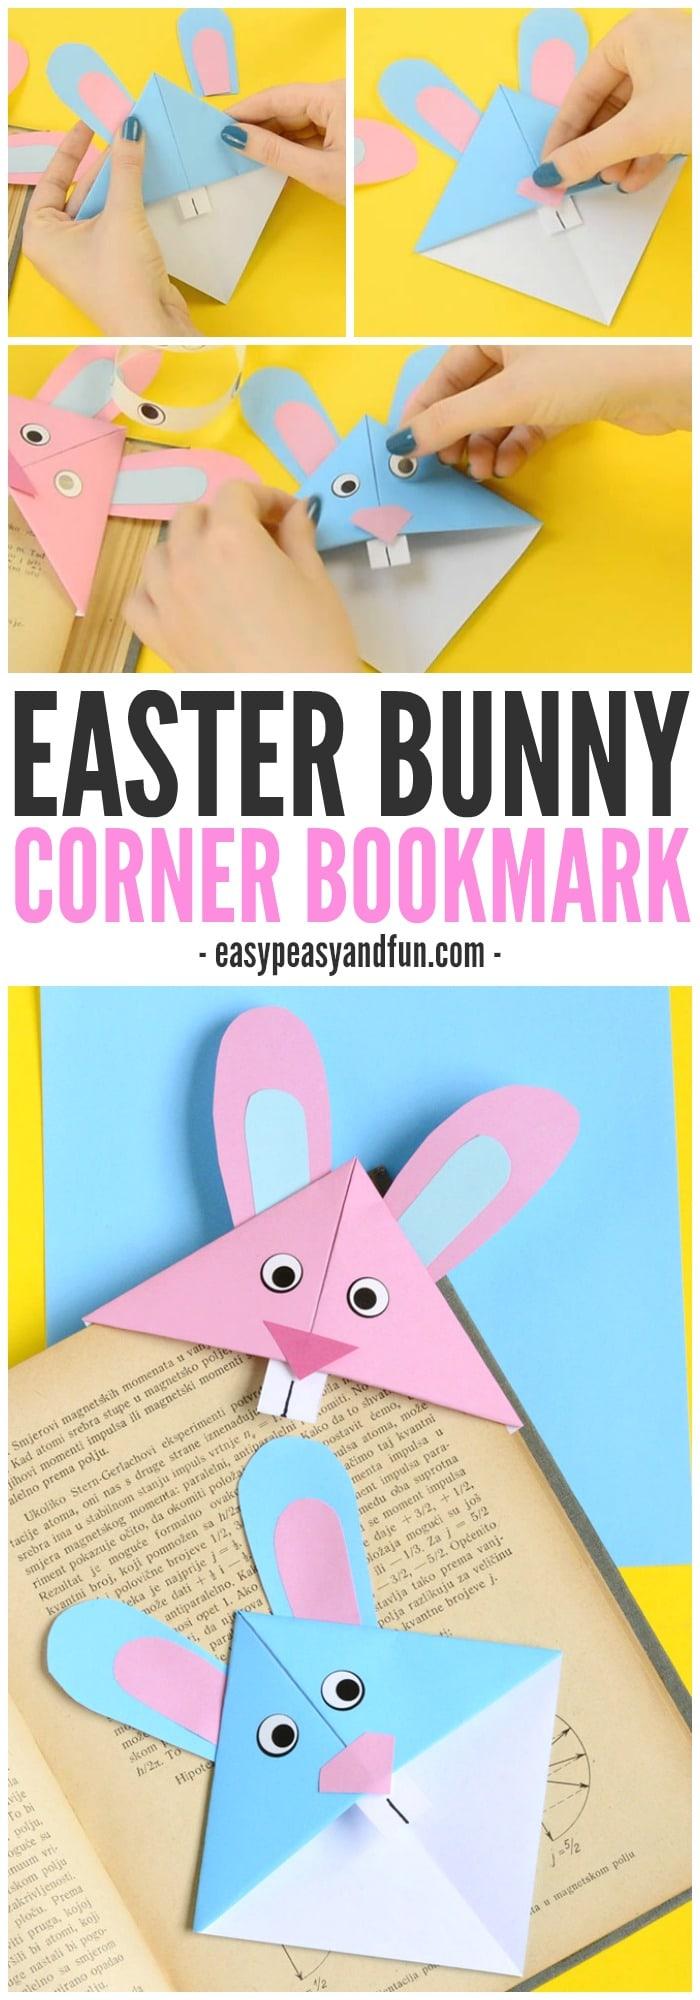 Adorable Easter Bunny Corner Bookmark Craft for Kids